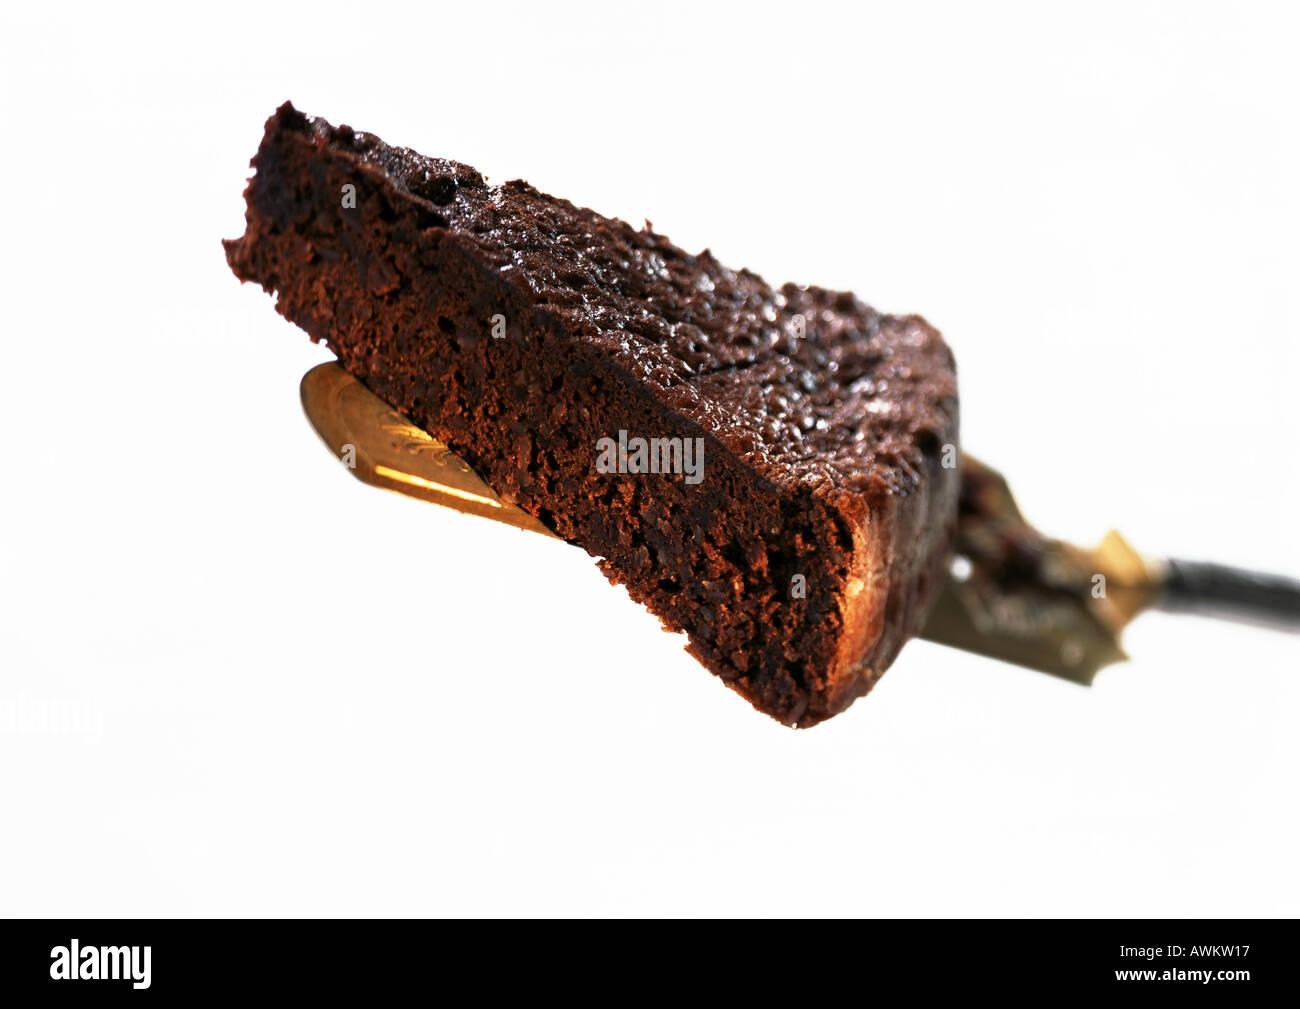 Piece of chocolate cake on cake server, close-up, white background - Stock Image